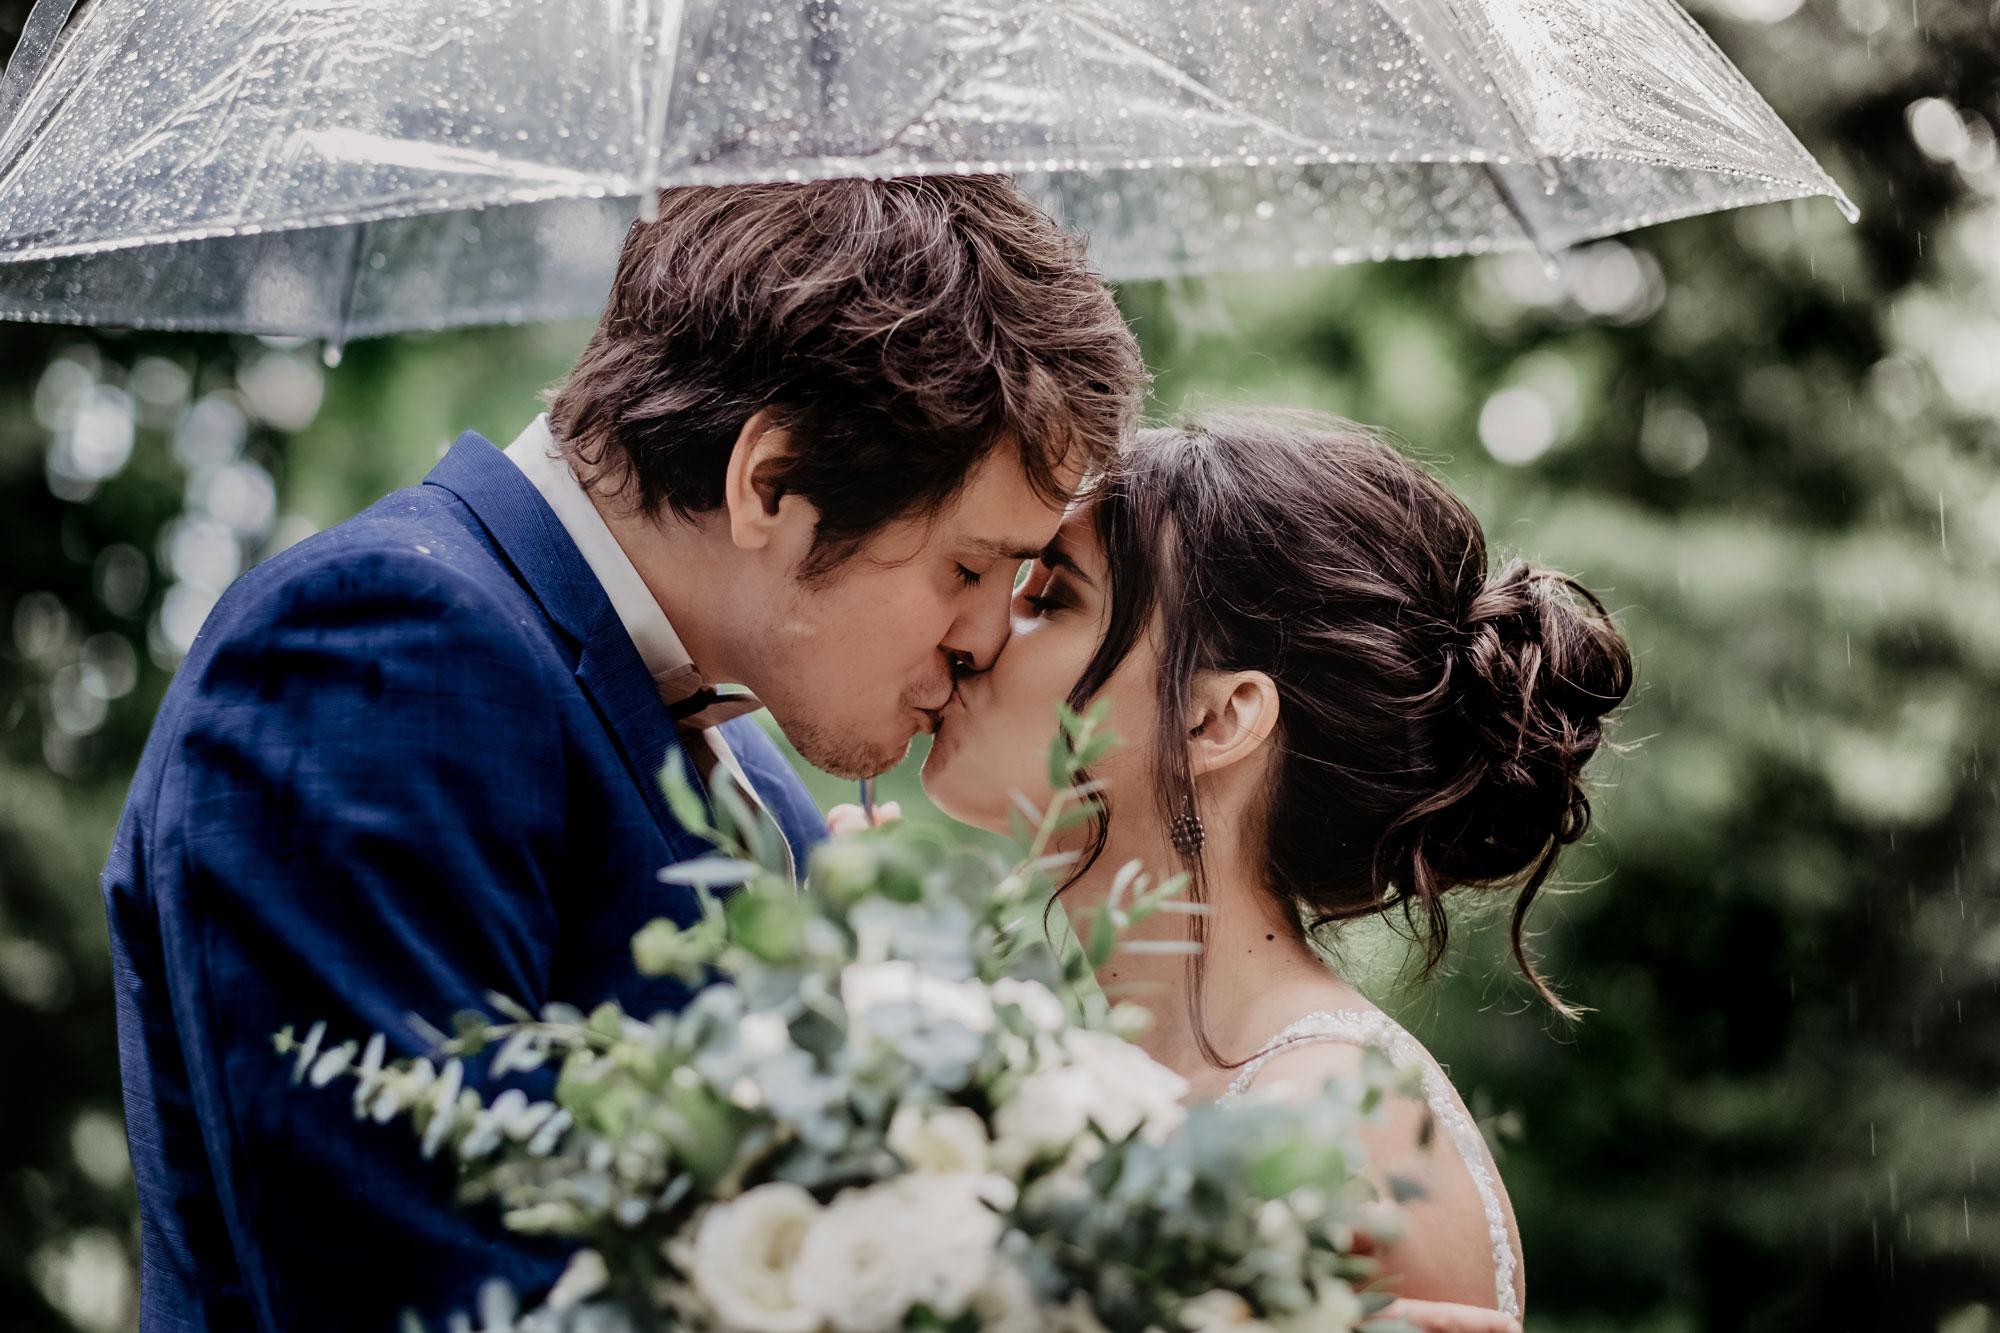 Tackling a rainy wedding day